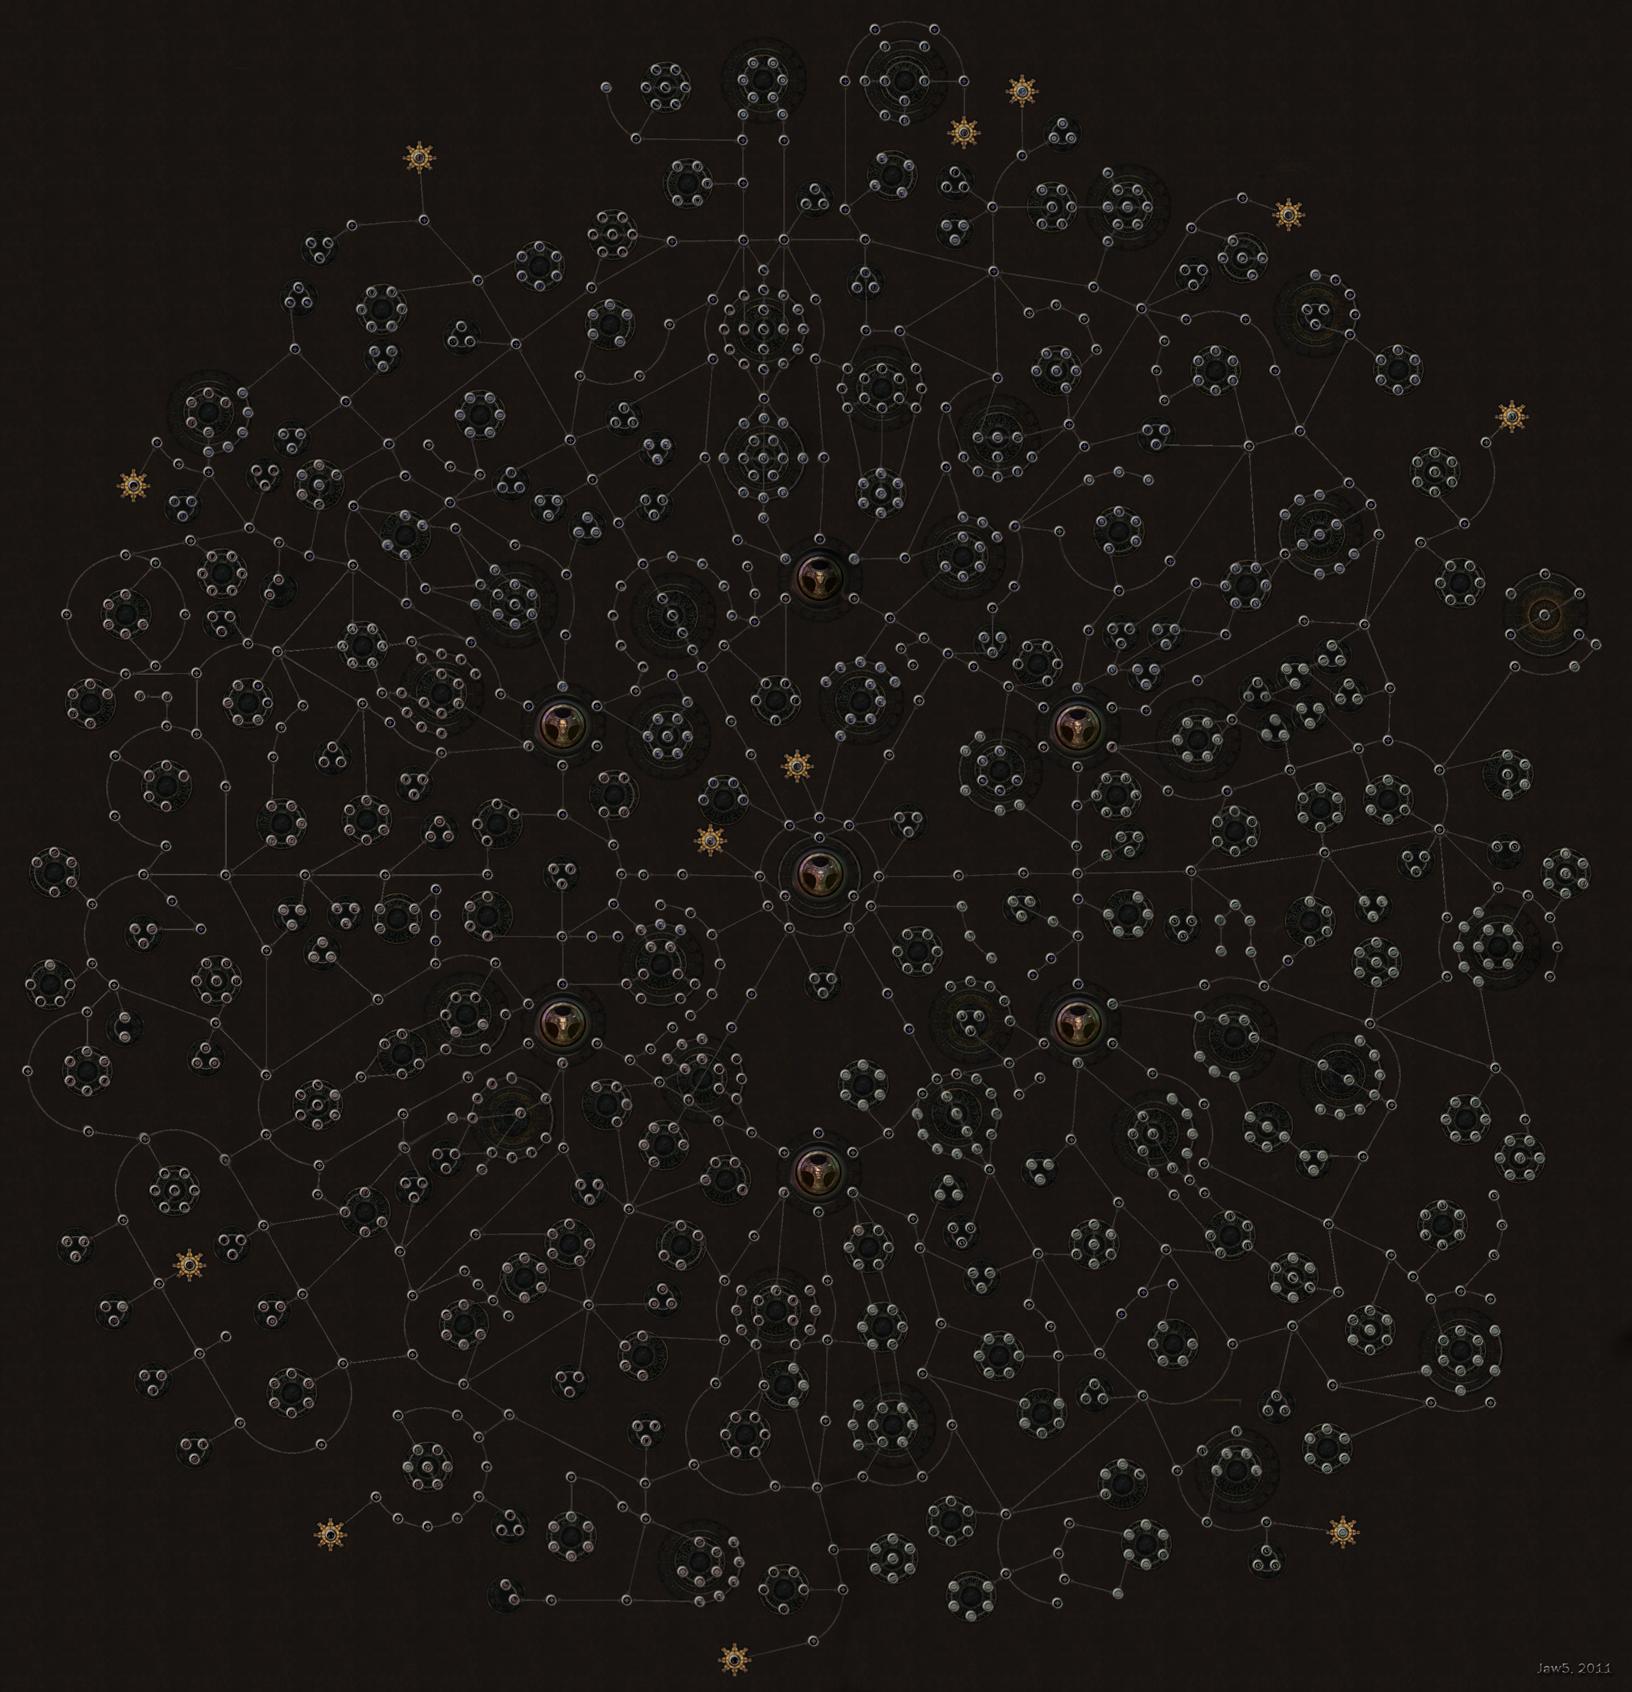 IMAGE(http://fc03.deviantart.net/fs70/f/2011/362/4/9/poe_skill_tree__by_jawsofhana-d4kgzrv.jpg)